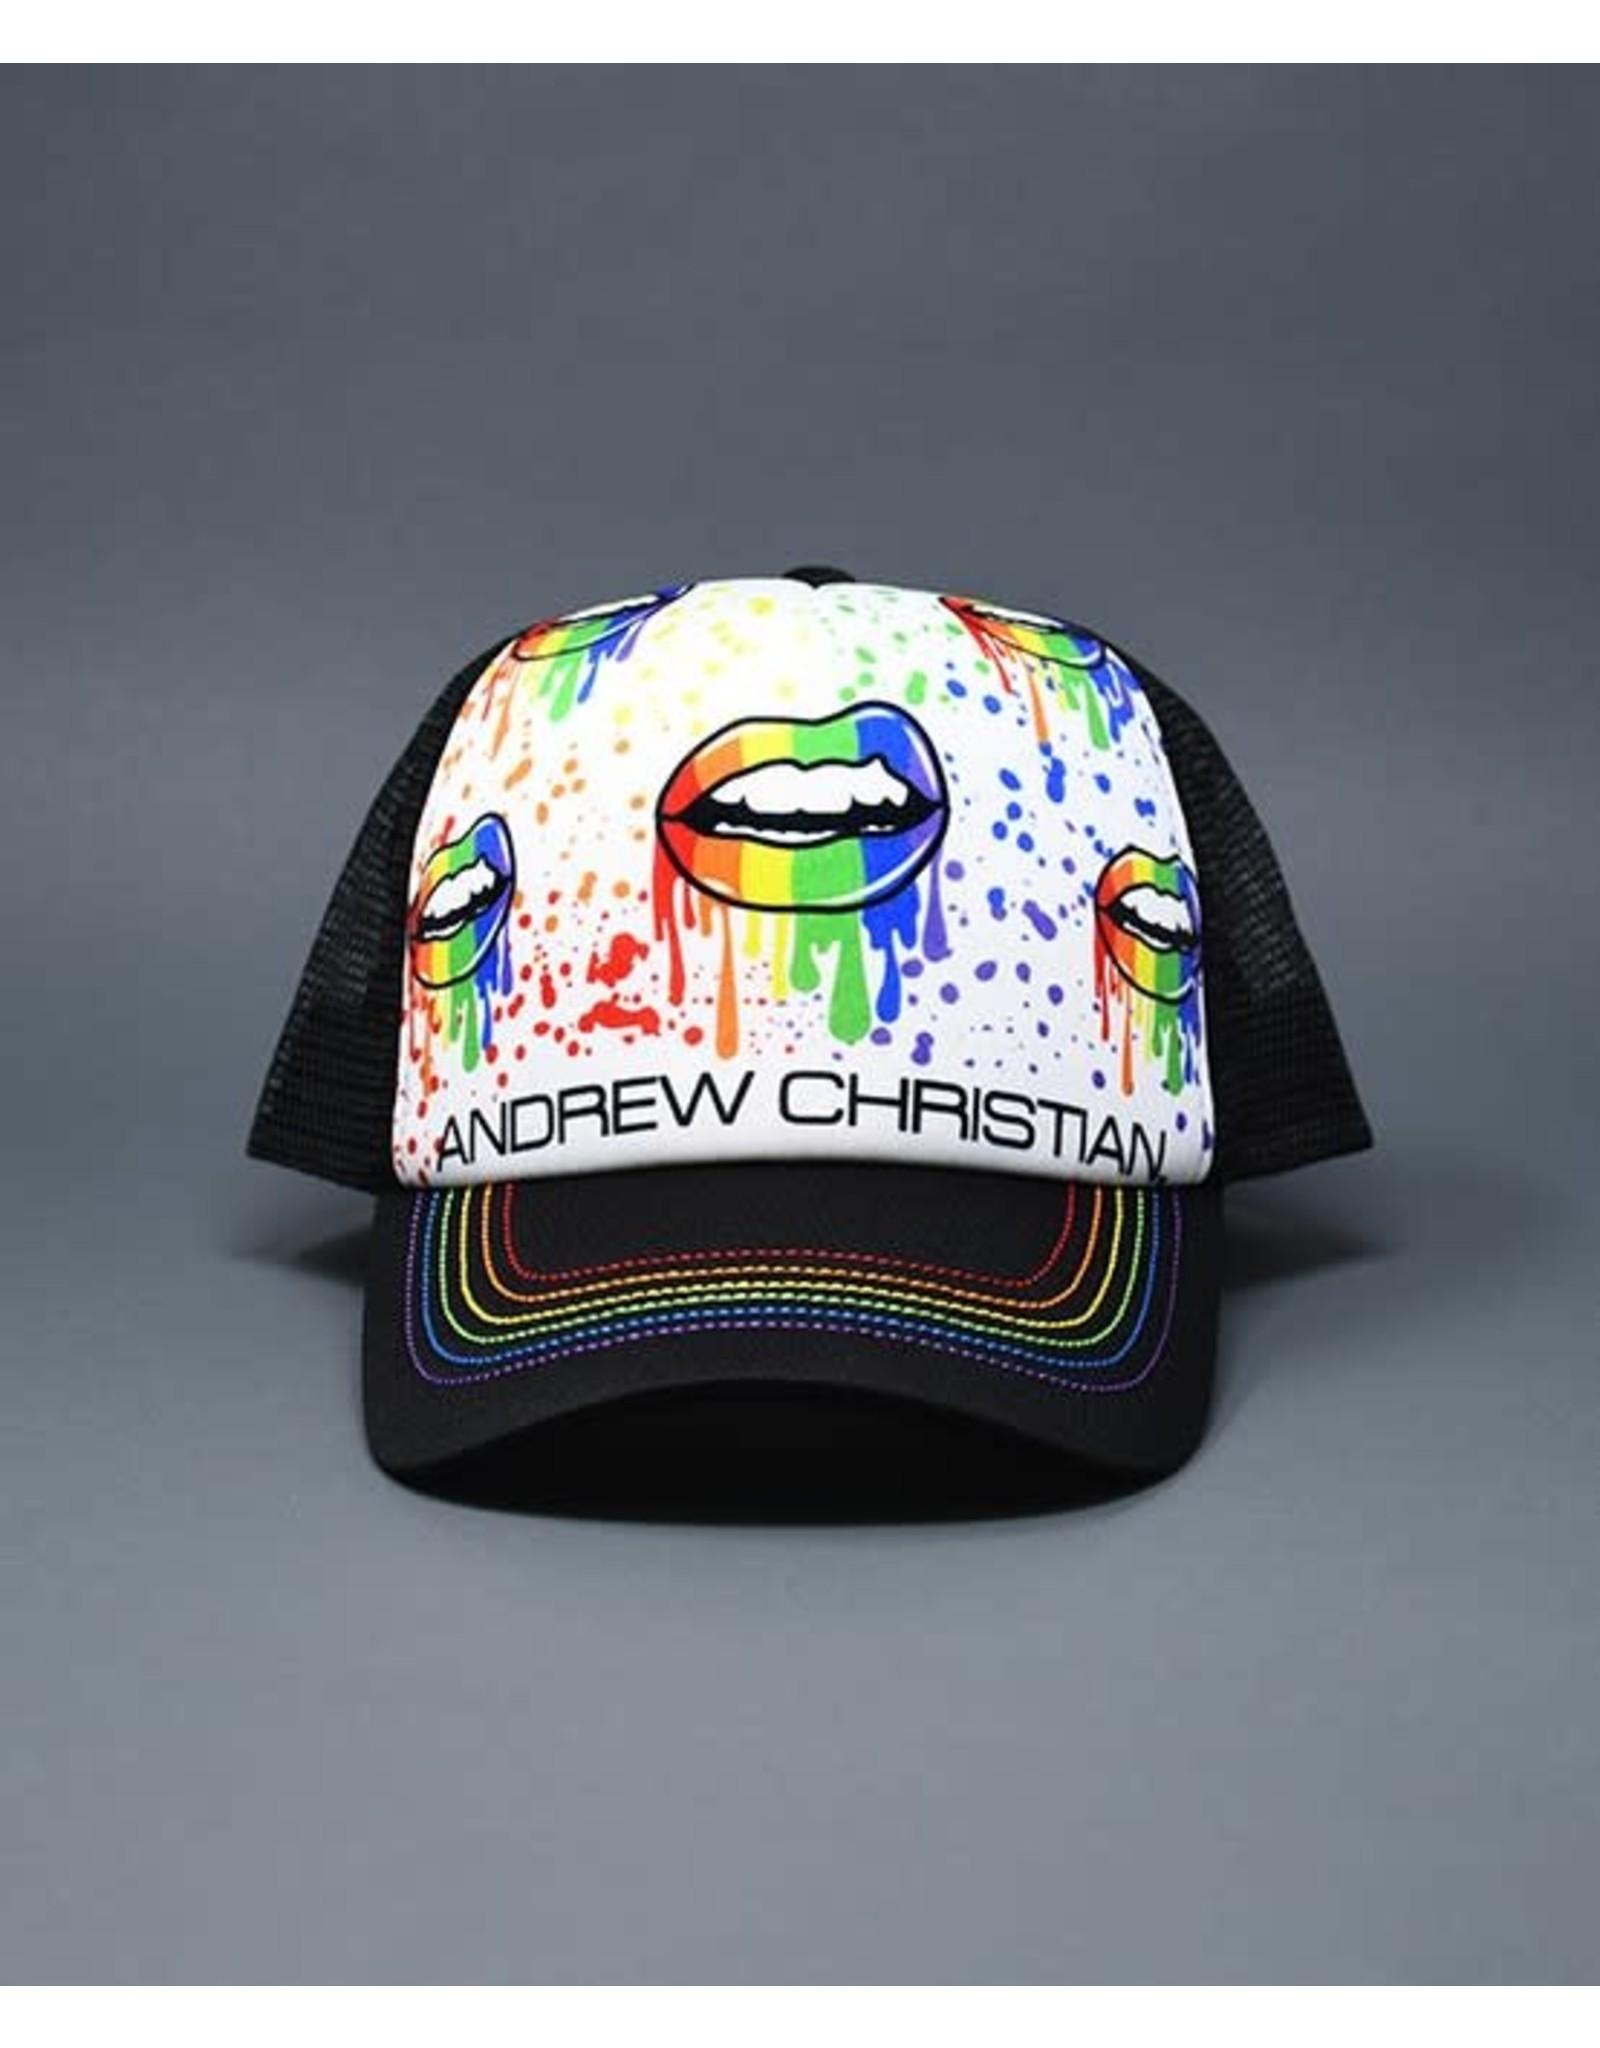 ANDREW CHRISTIAN PRIDE LIPS CAP